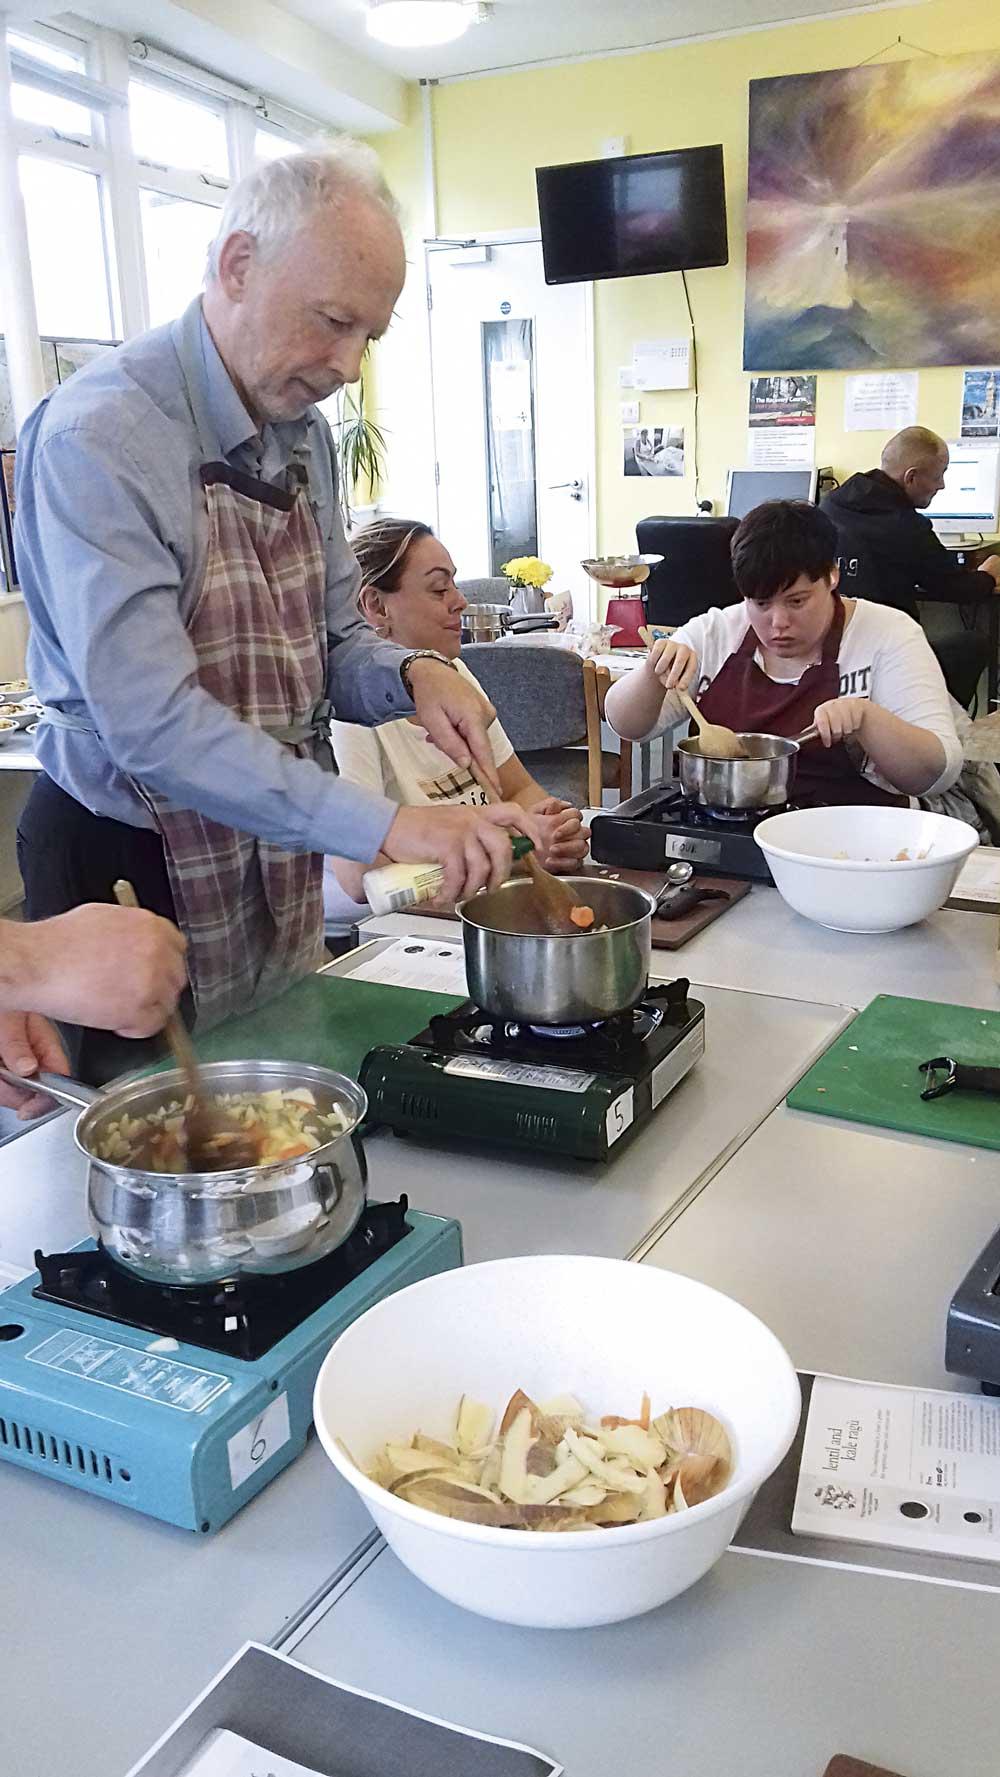 Cookery workshop